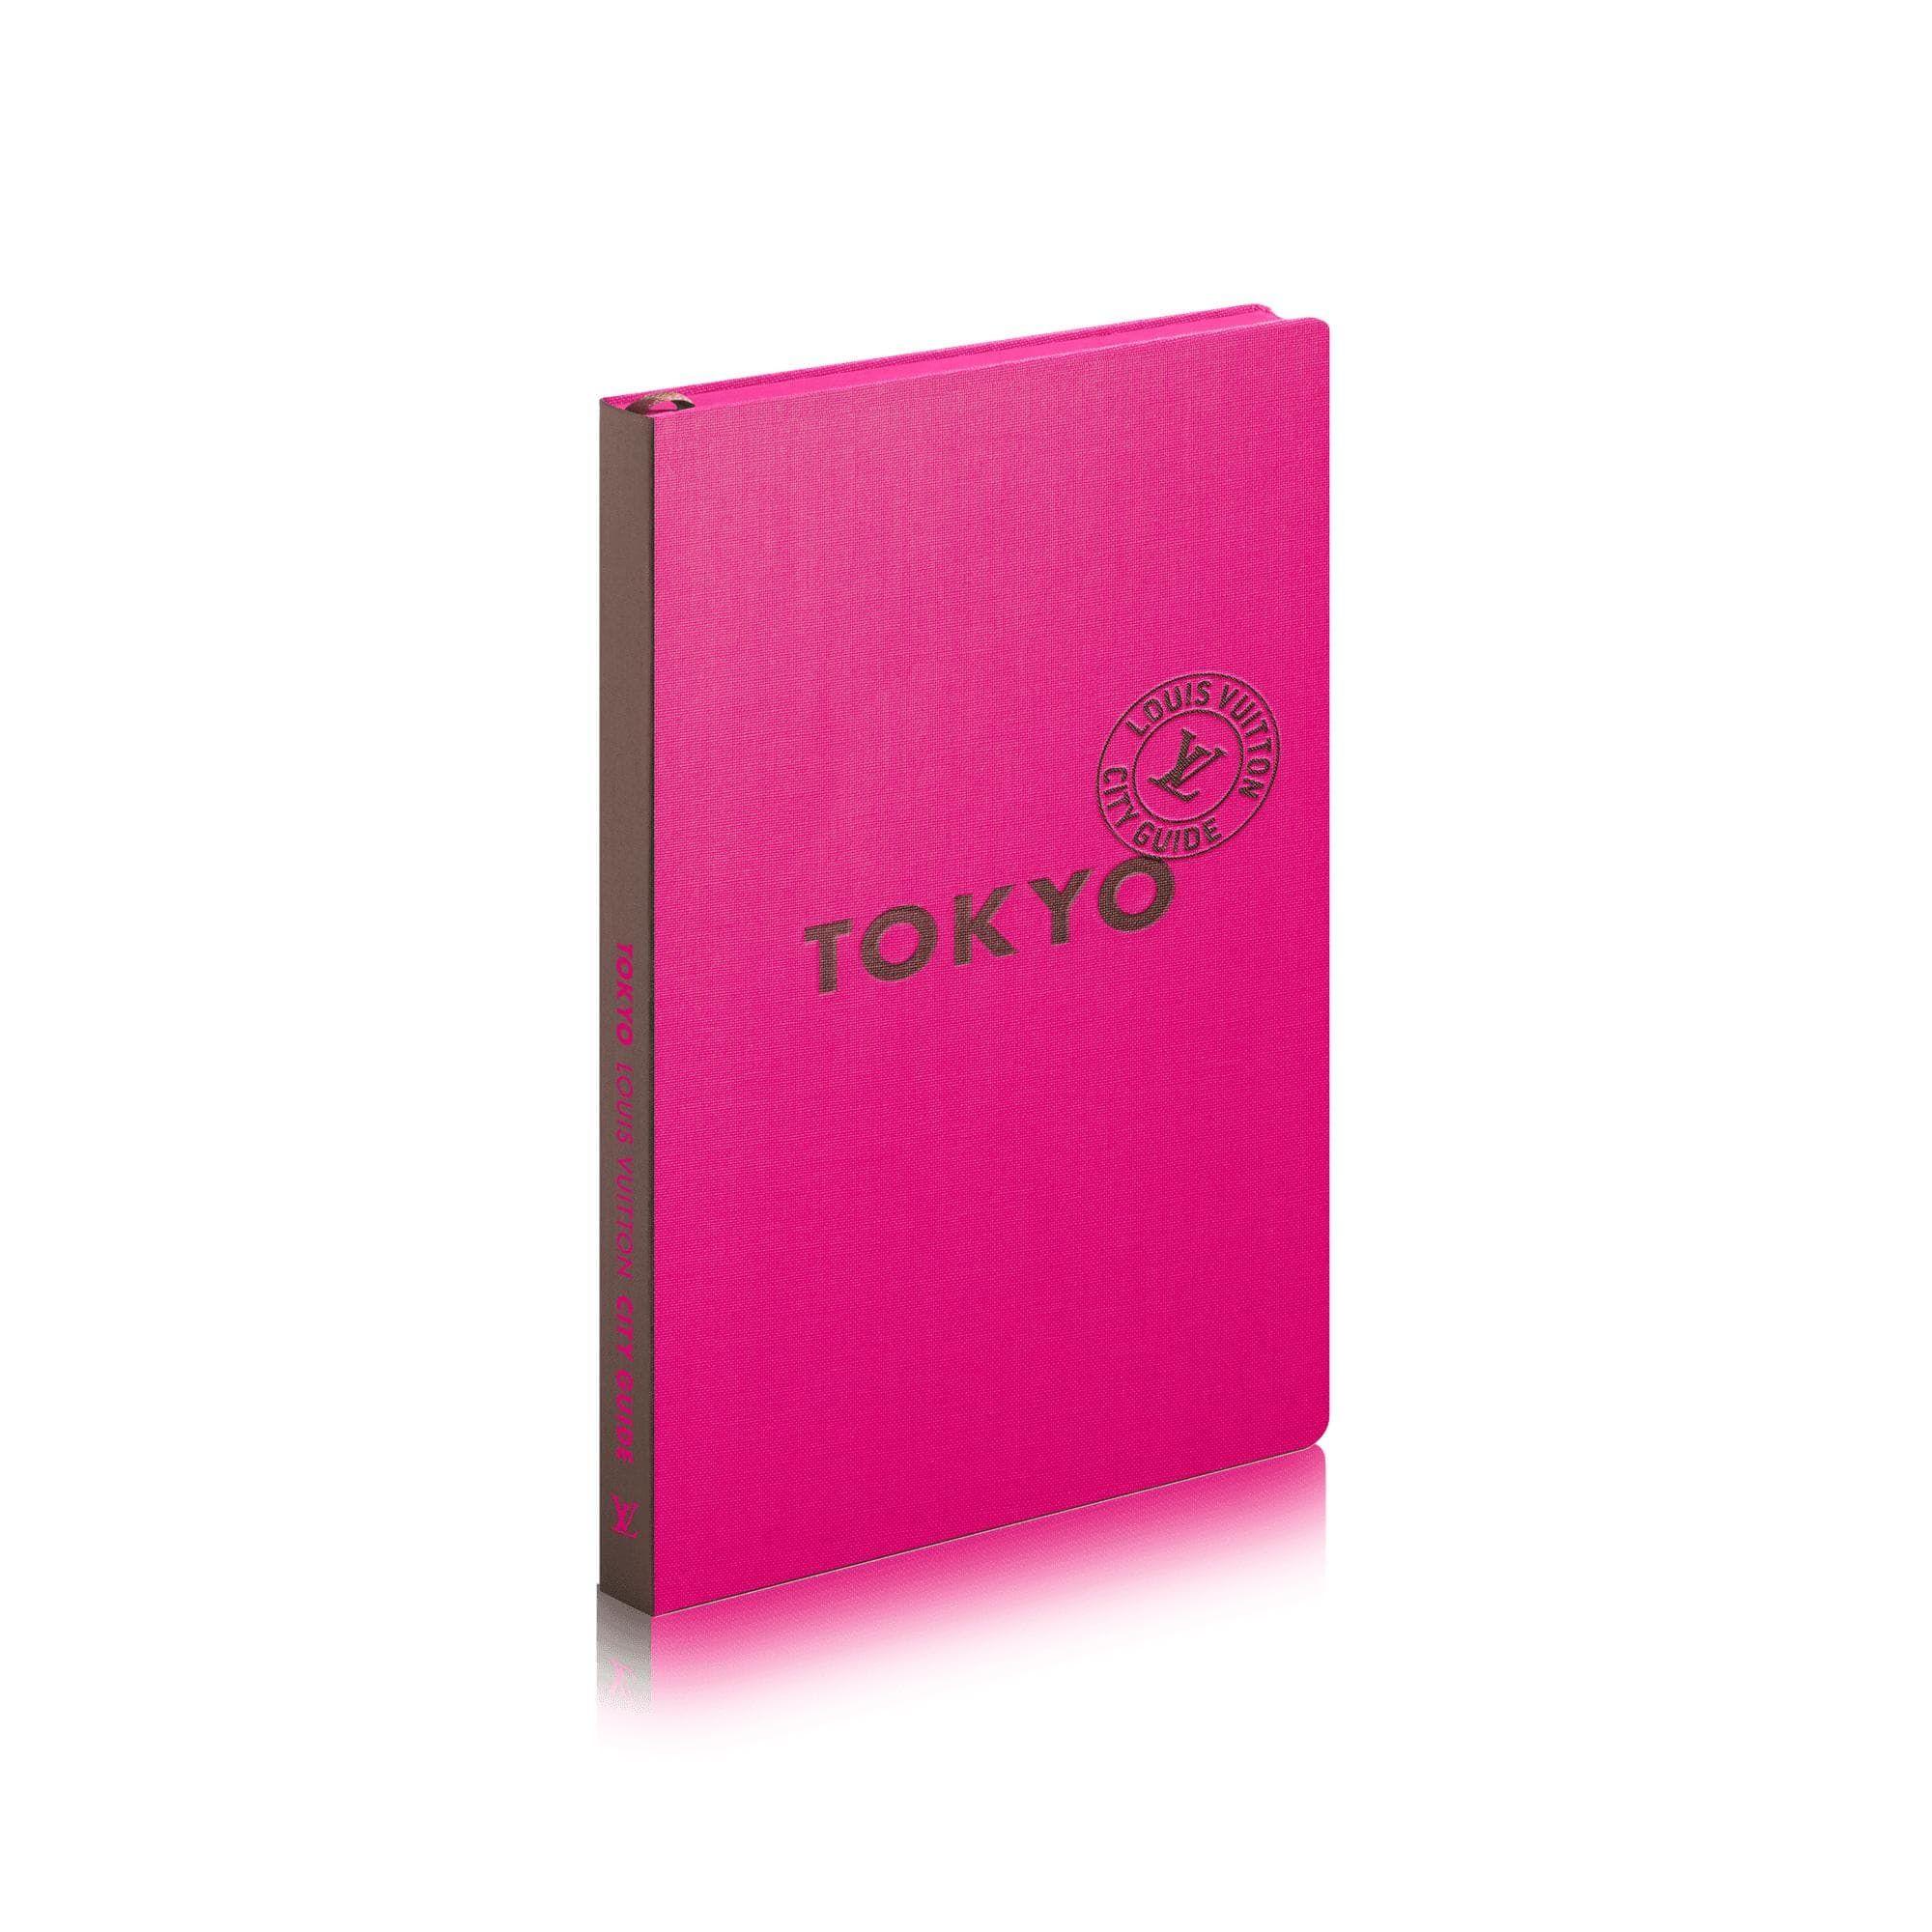 Tokyo City Guide English Version Via Louis Vuitton Tokyo City City Guide Tokyo Guide